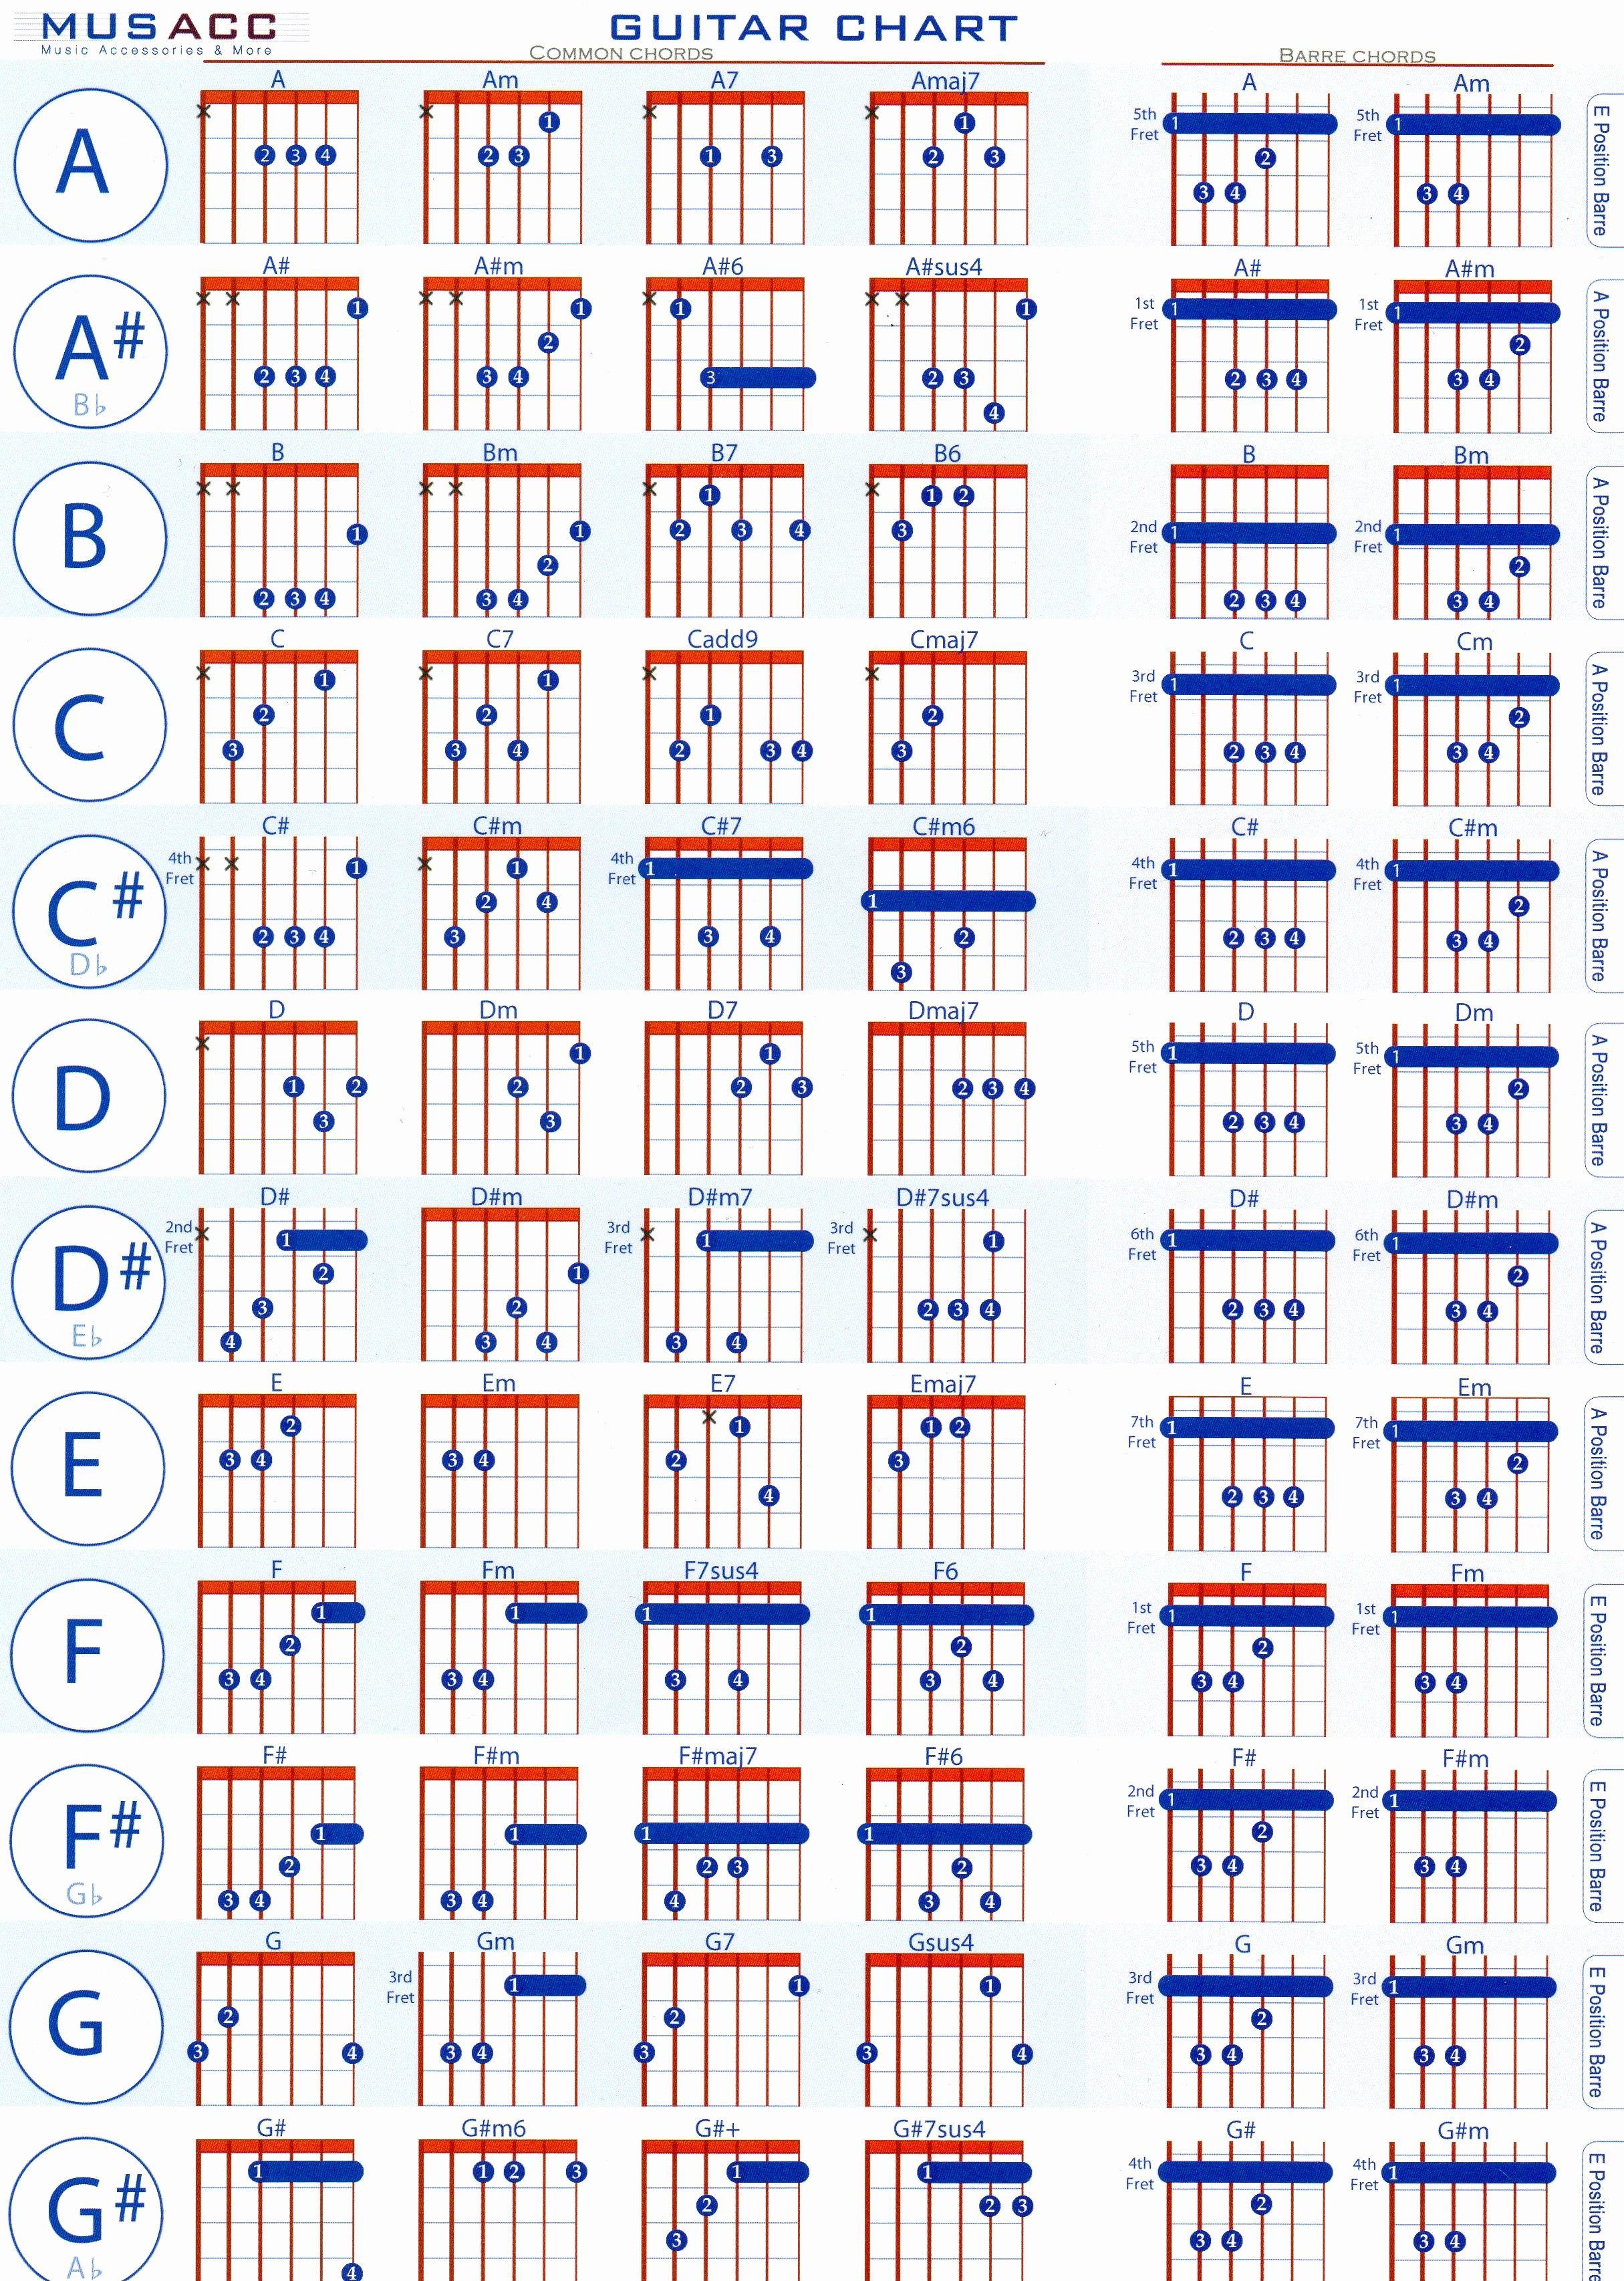 Simple Guitar Chord Chart Pdf Lovely 15 Basic Guitar Chords for ...